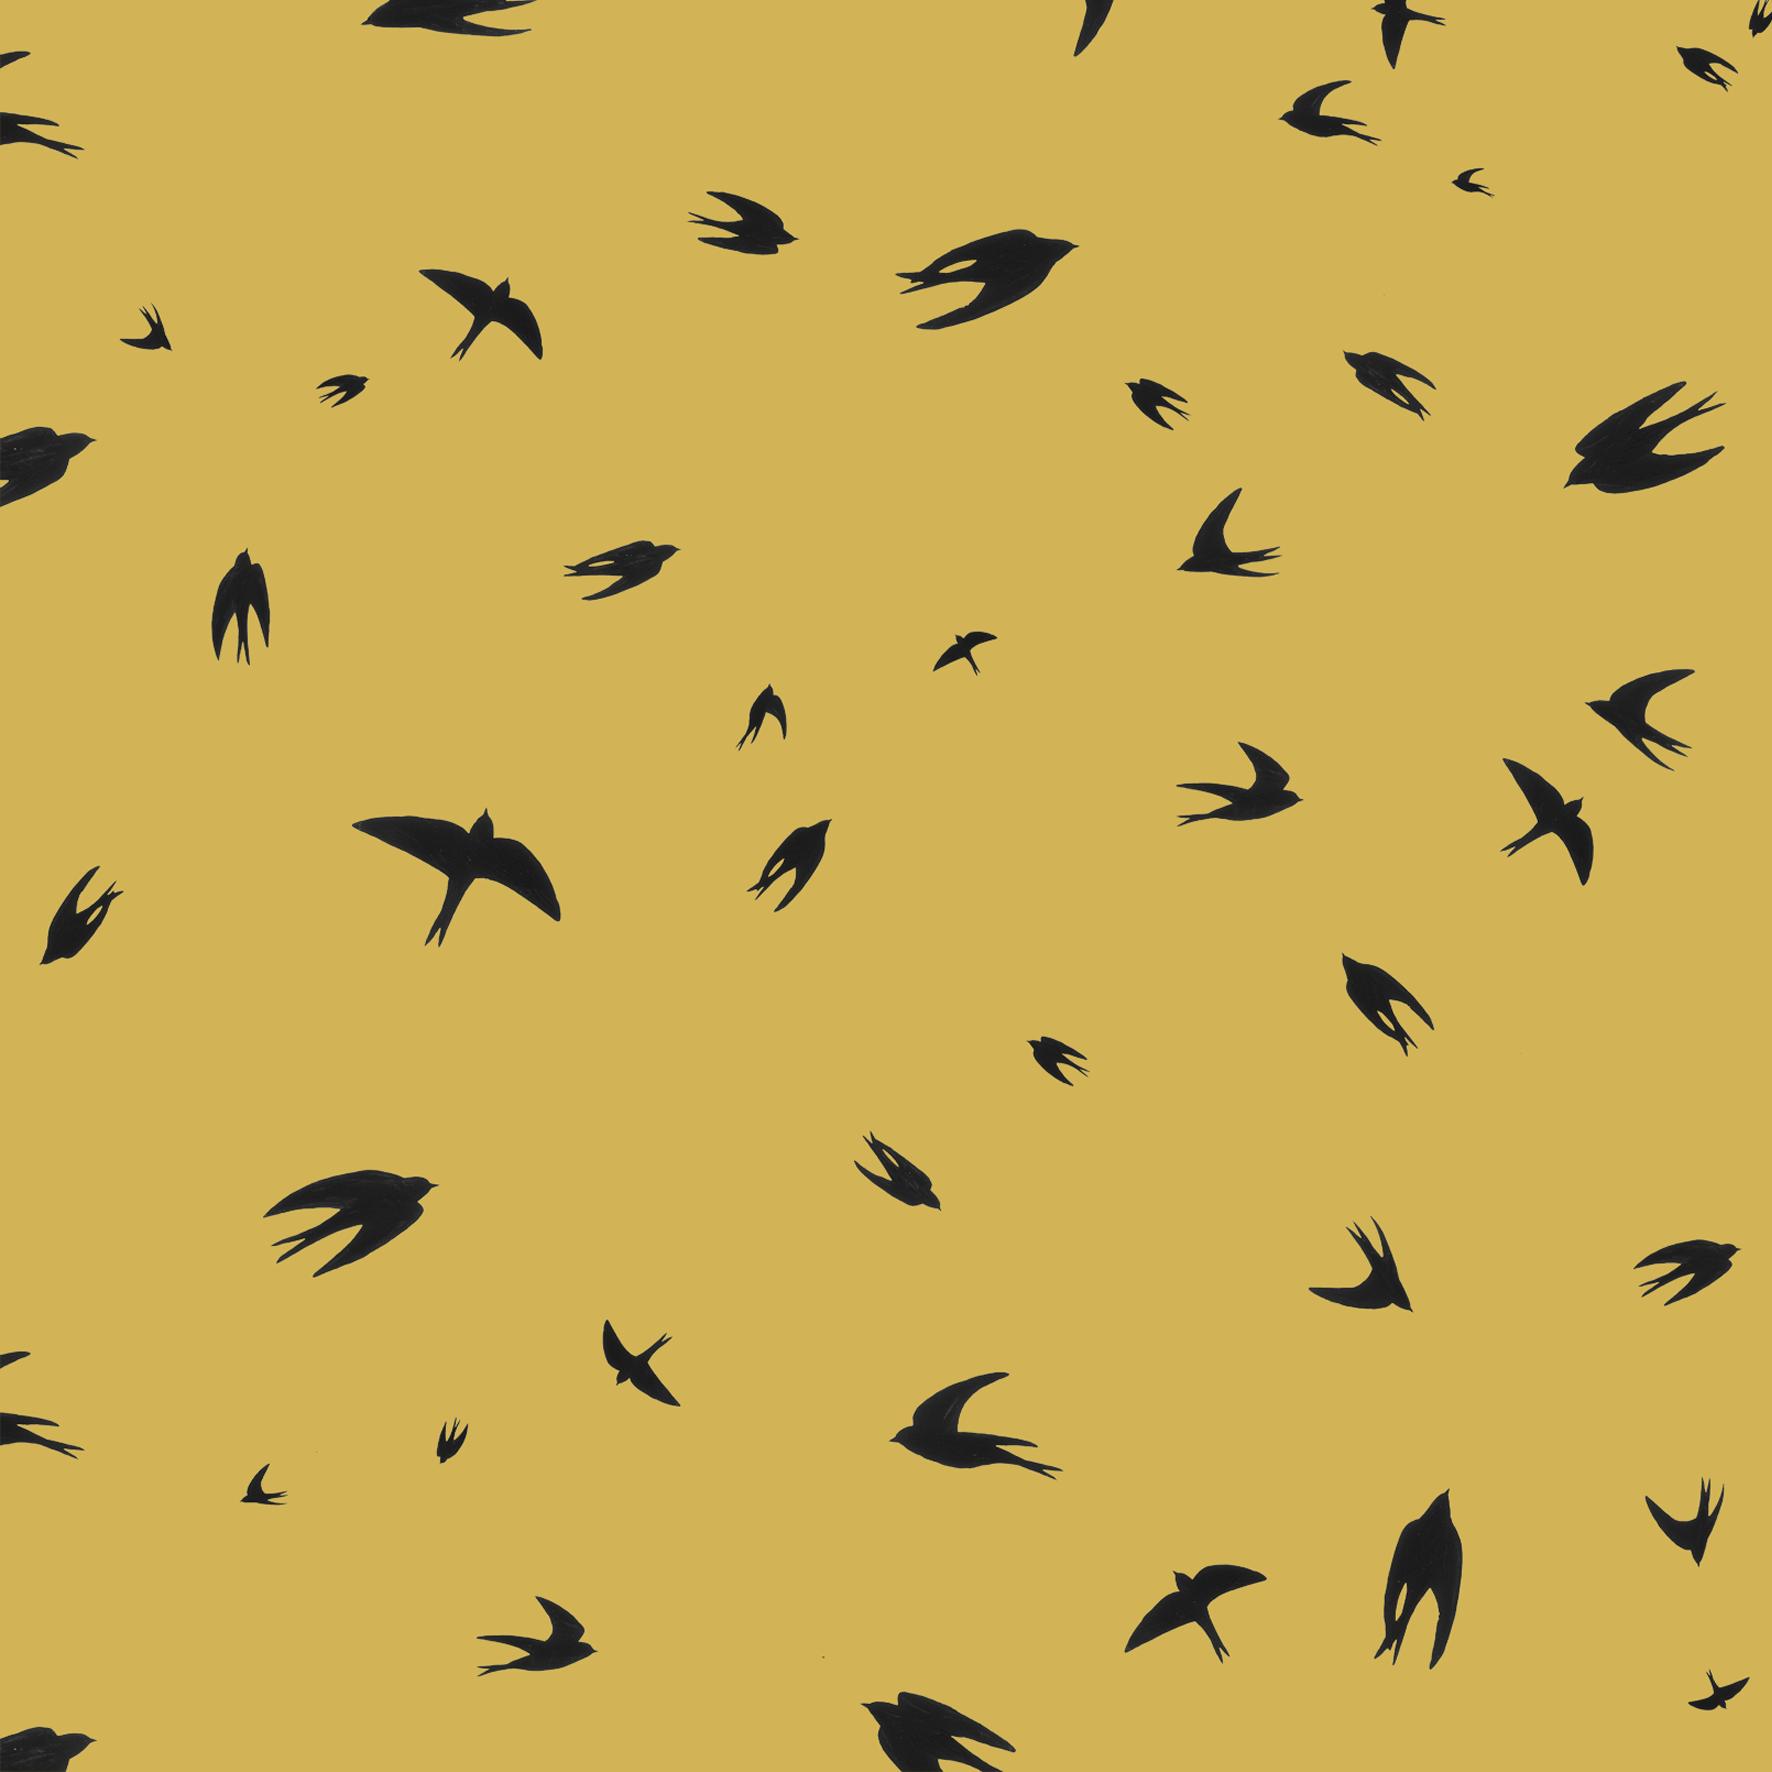 melissa boardman  flying swallows scatter.png